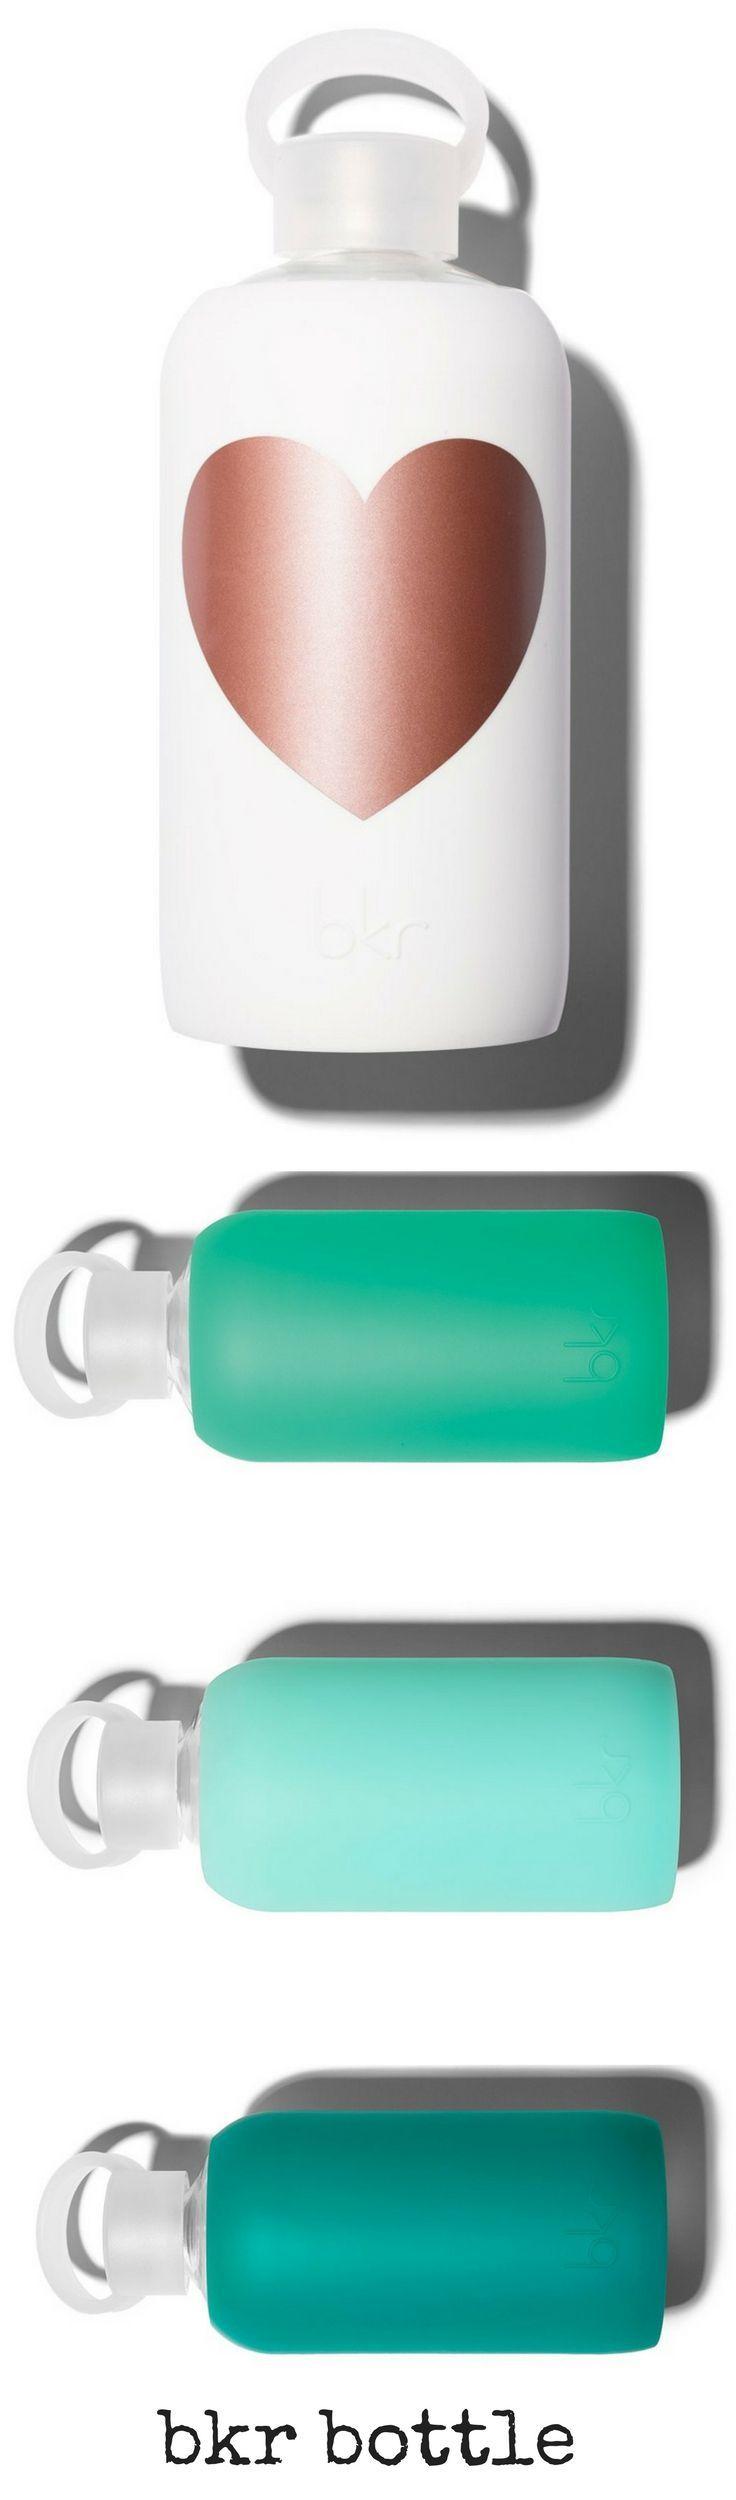 bkr bottle | bkr bottle colors | best water bottle | glass | silicone | healthy | safe | Tiffany blue | heart | sponsored